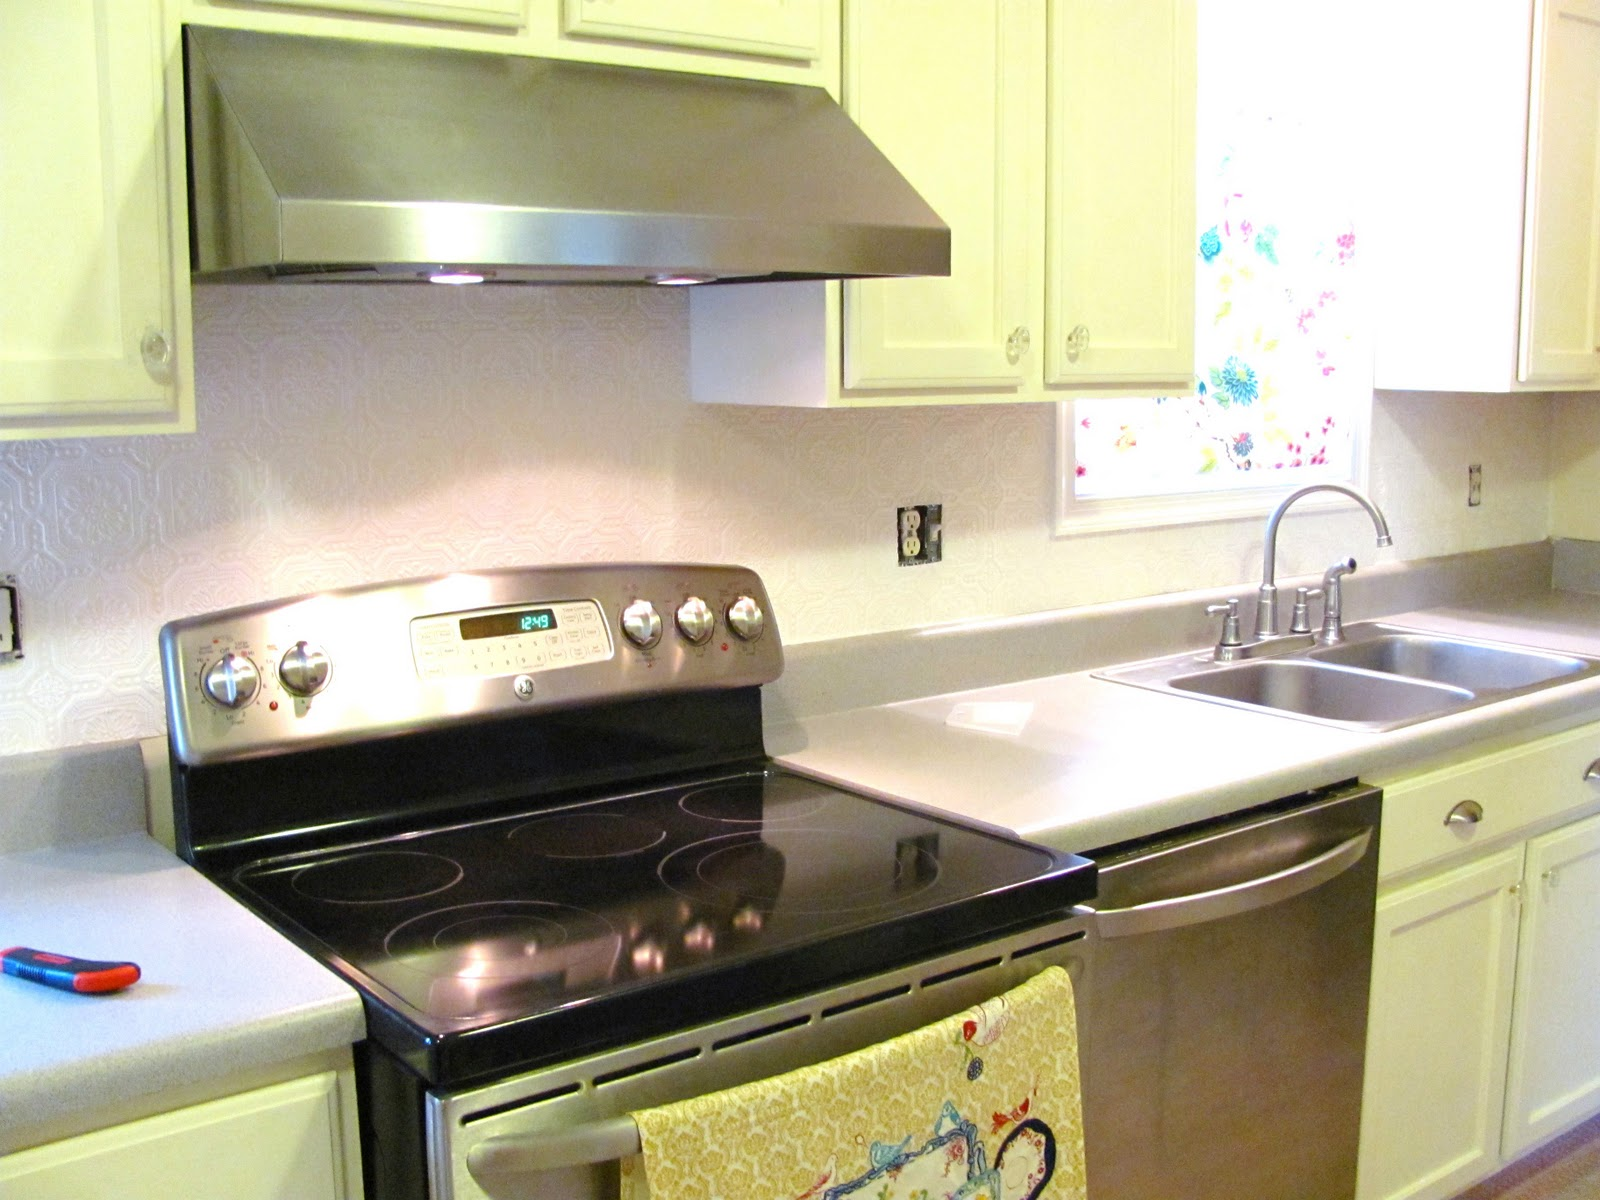 Inexpensive Kitchen Ideas Silver Lining Decor Wallpaper Backsplash D I Y Part 1